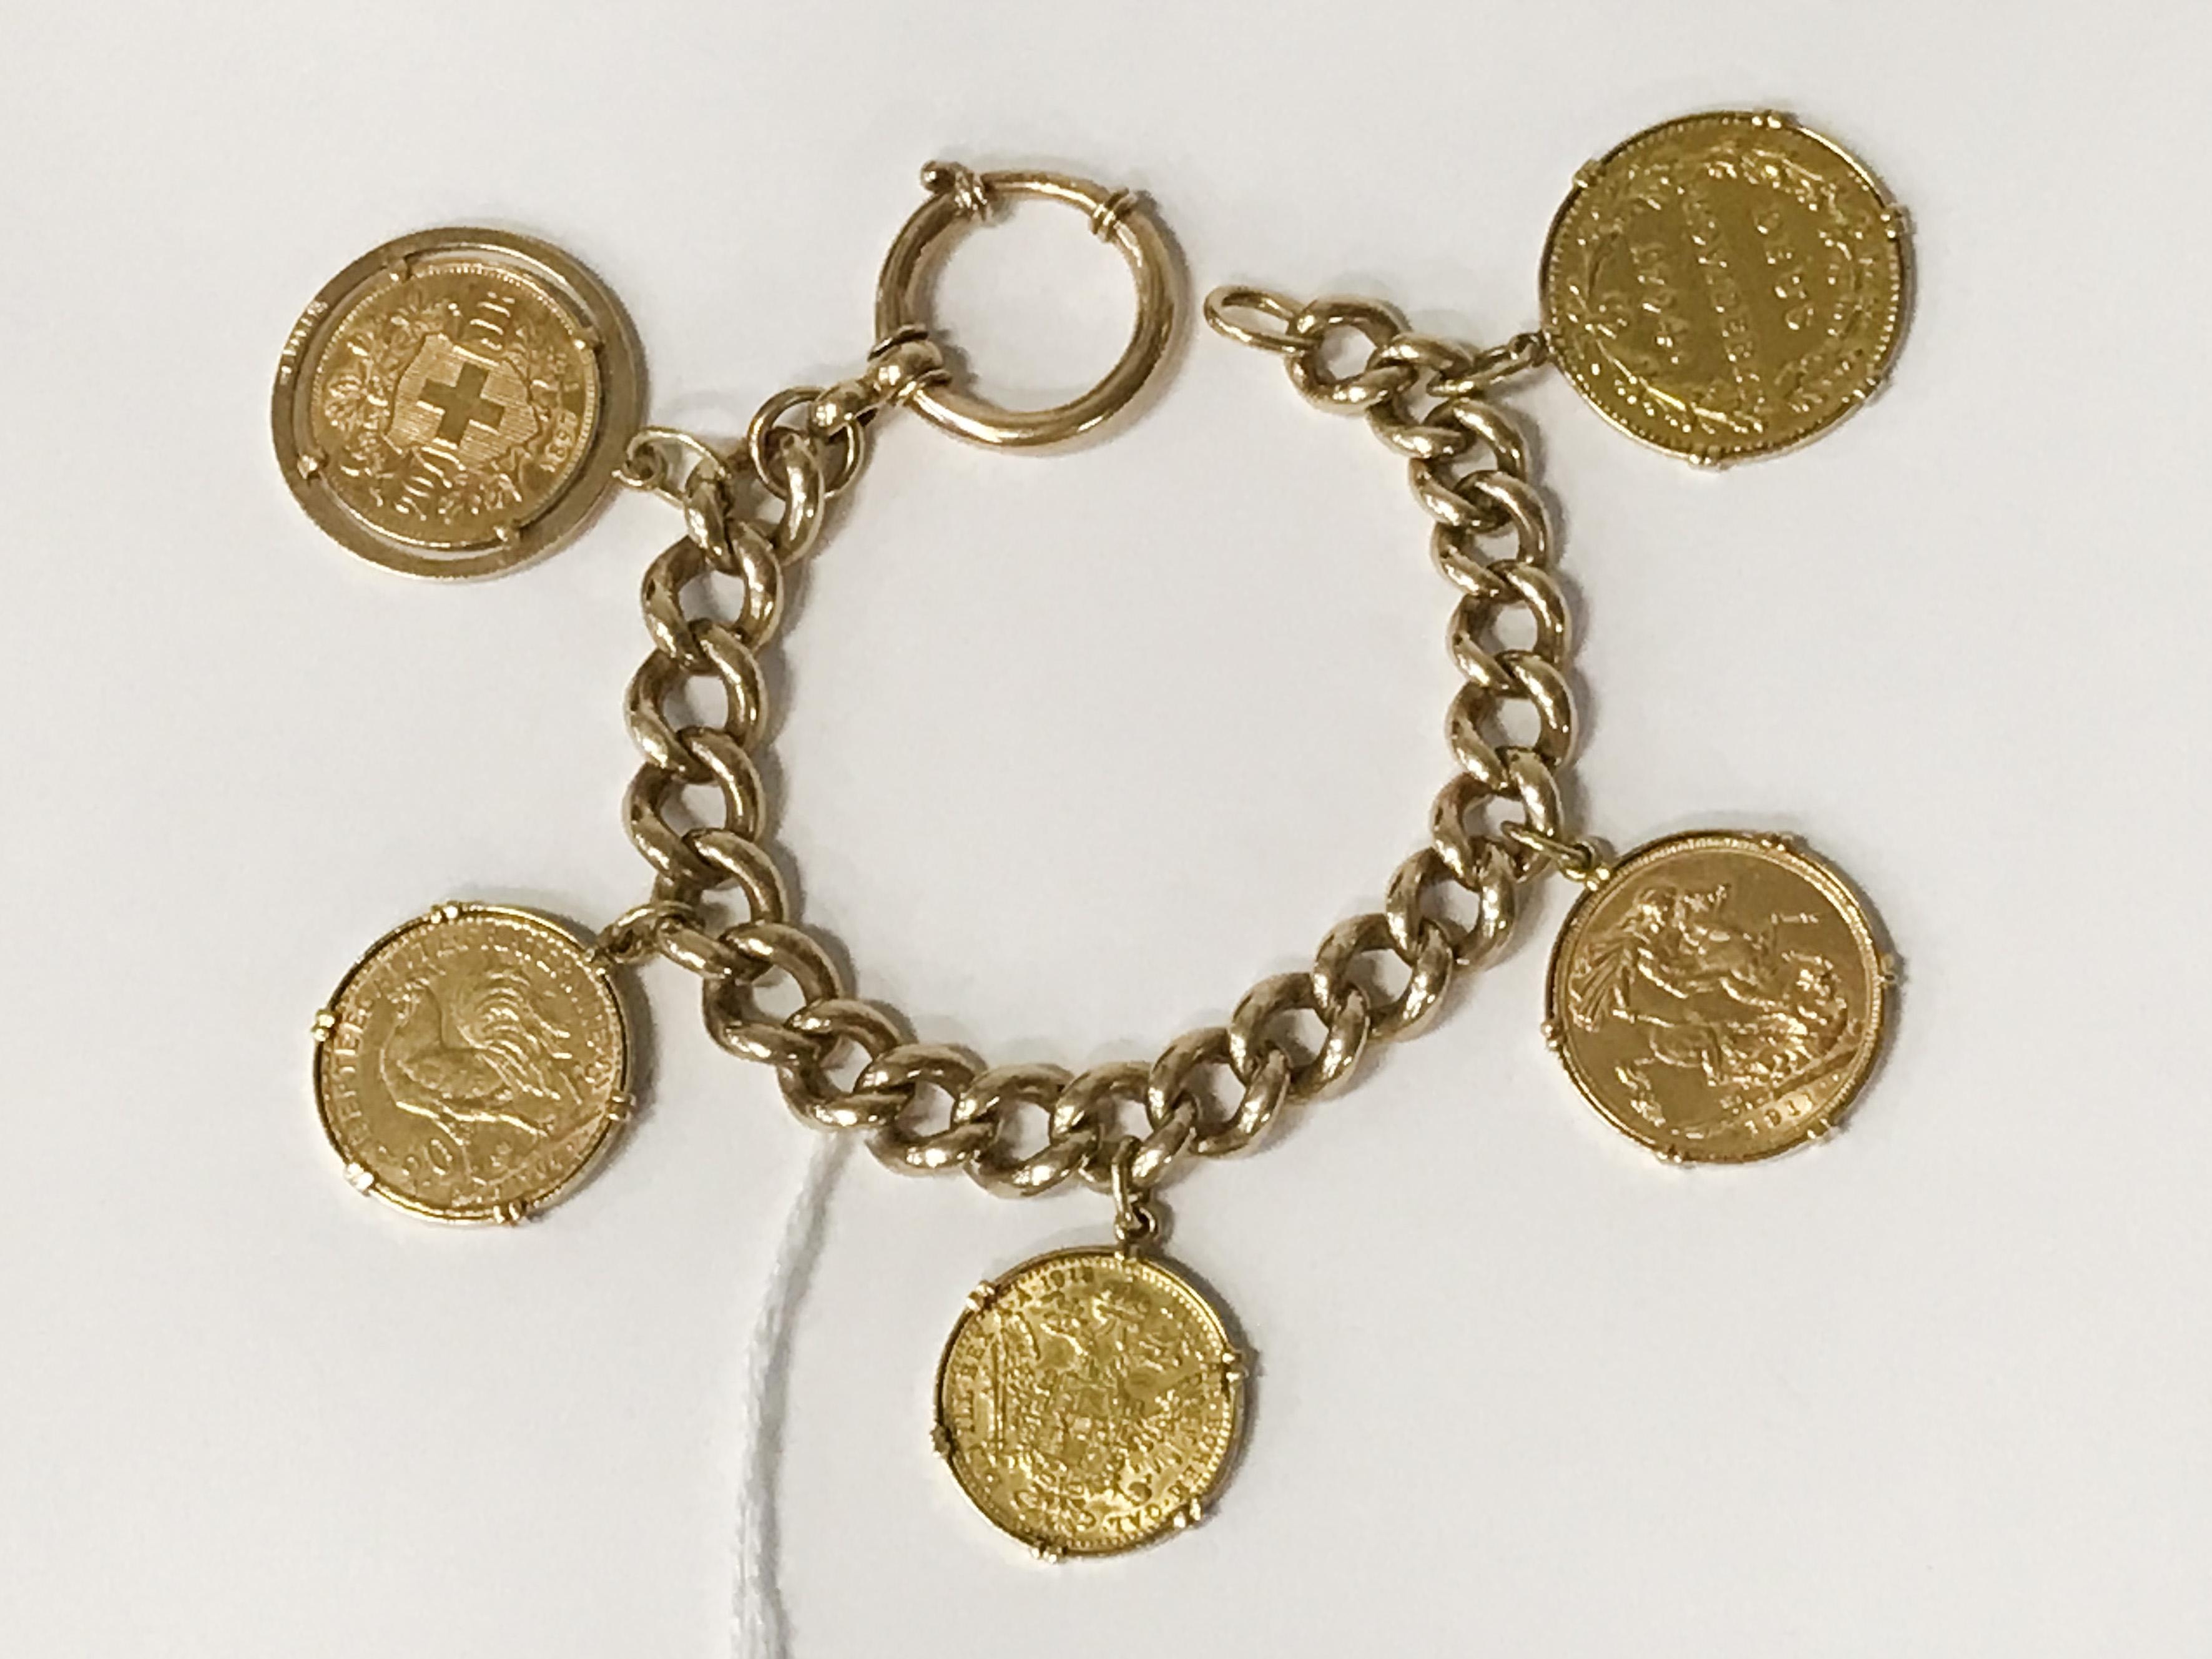 VINTAGE MULTO GOLD COINS BRACELET - 2 X 20 SWISS FRANC COINS, 1 AUSTRIAN DUCAT, 1 FULL SOVEREIGN, - Image 2 of 2